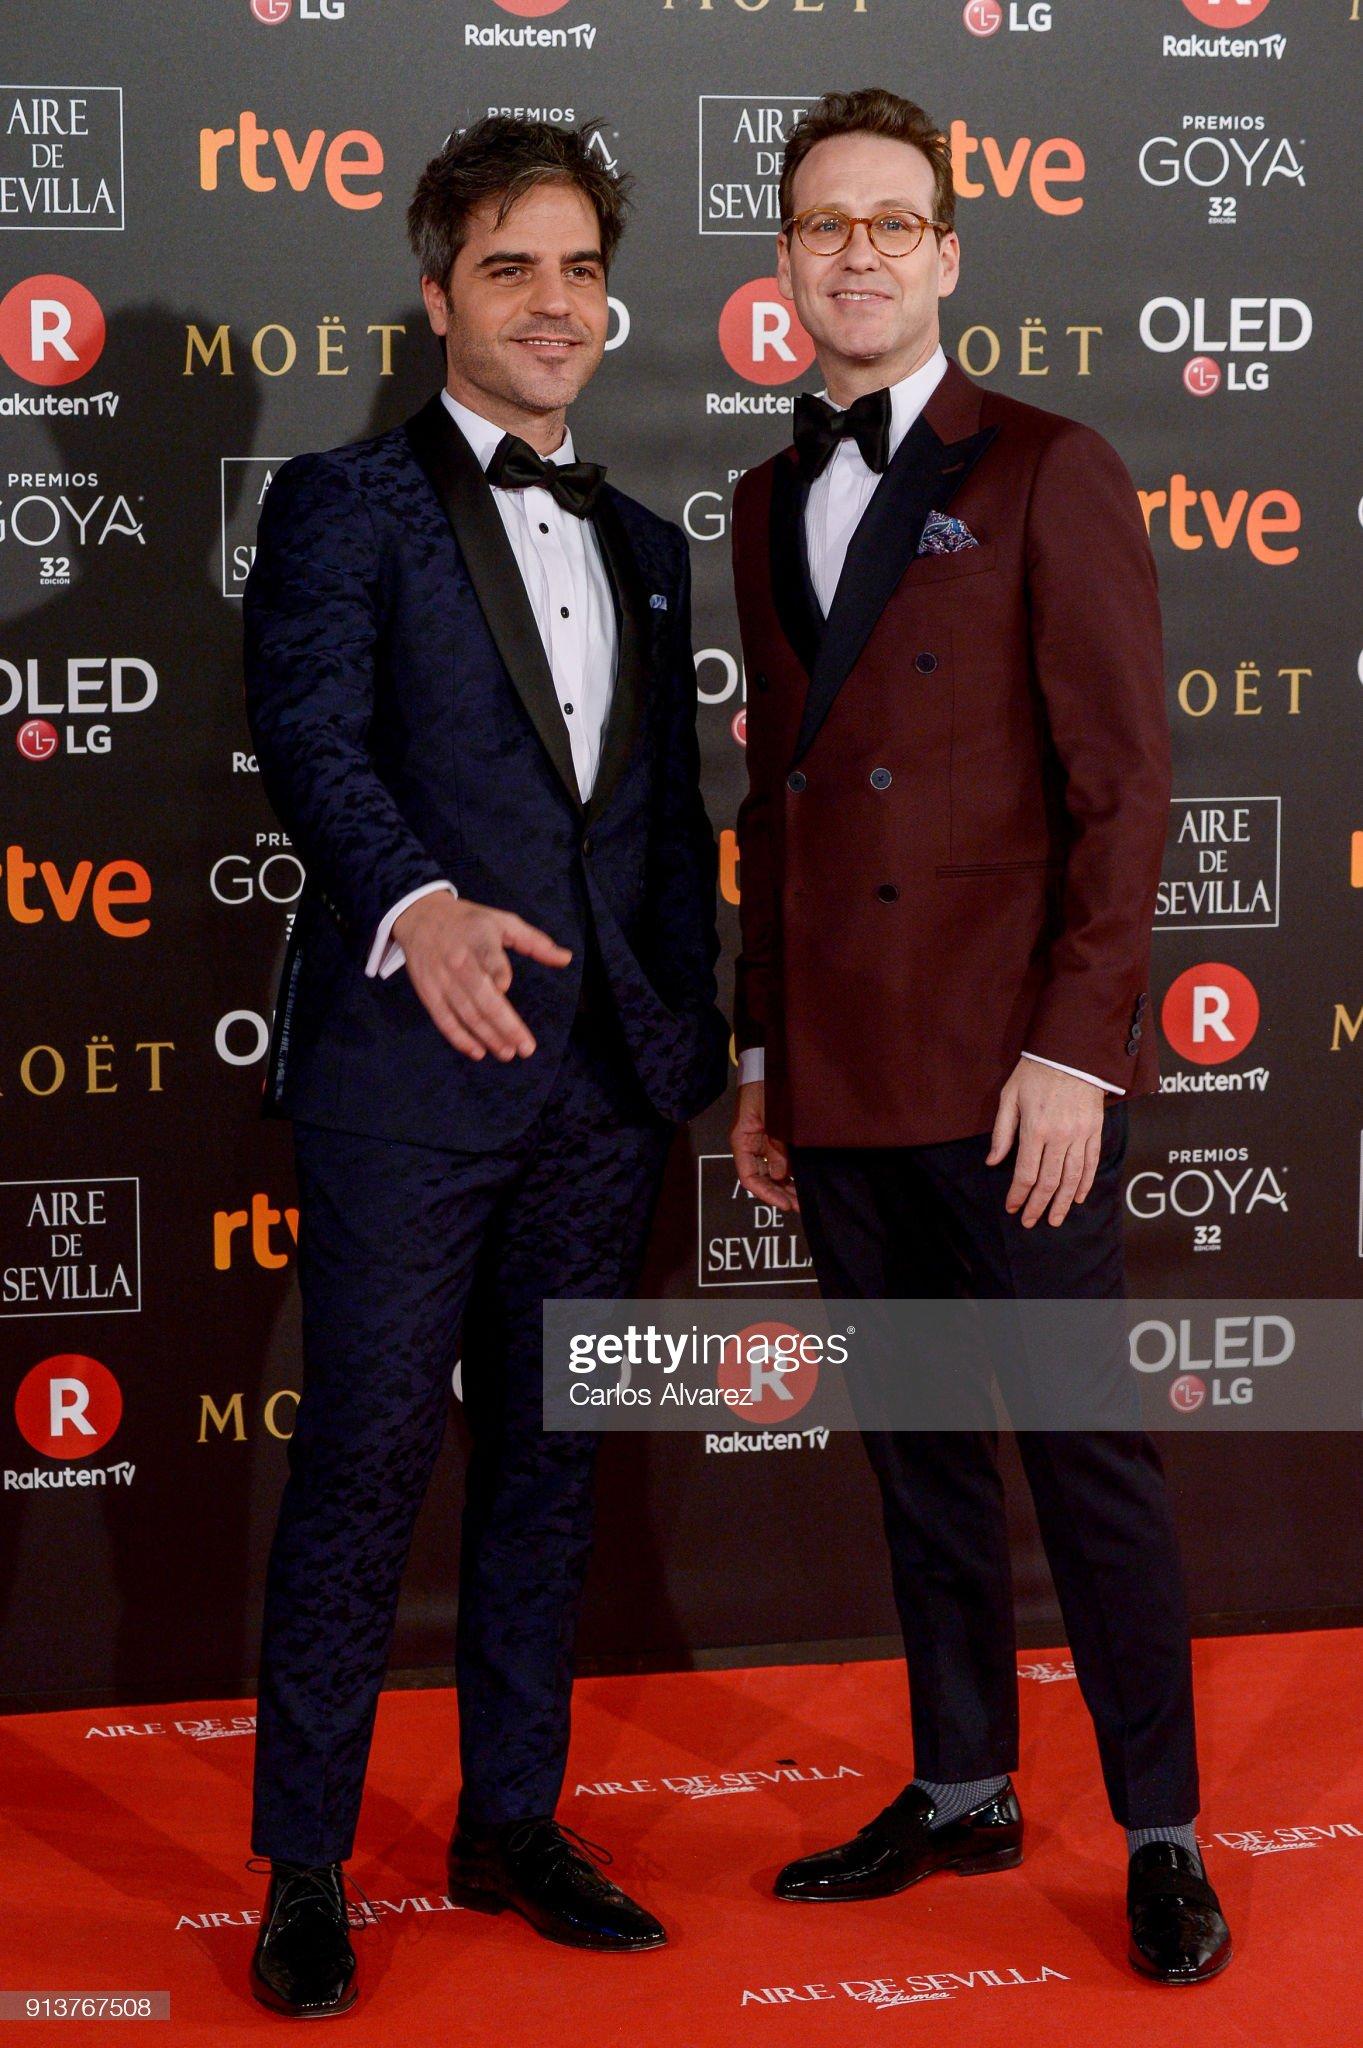 ¿Cuánto mide Ernesto Sevilla? - Altura Comedians-ernesto-sevilla-and-joaquin-reyes-attend-goya-cinema-awards-picture-id913767508?s=2048x2048